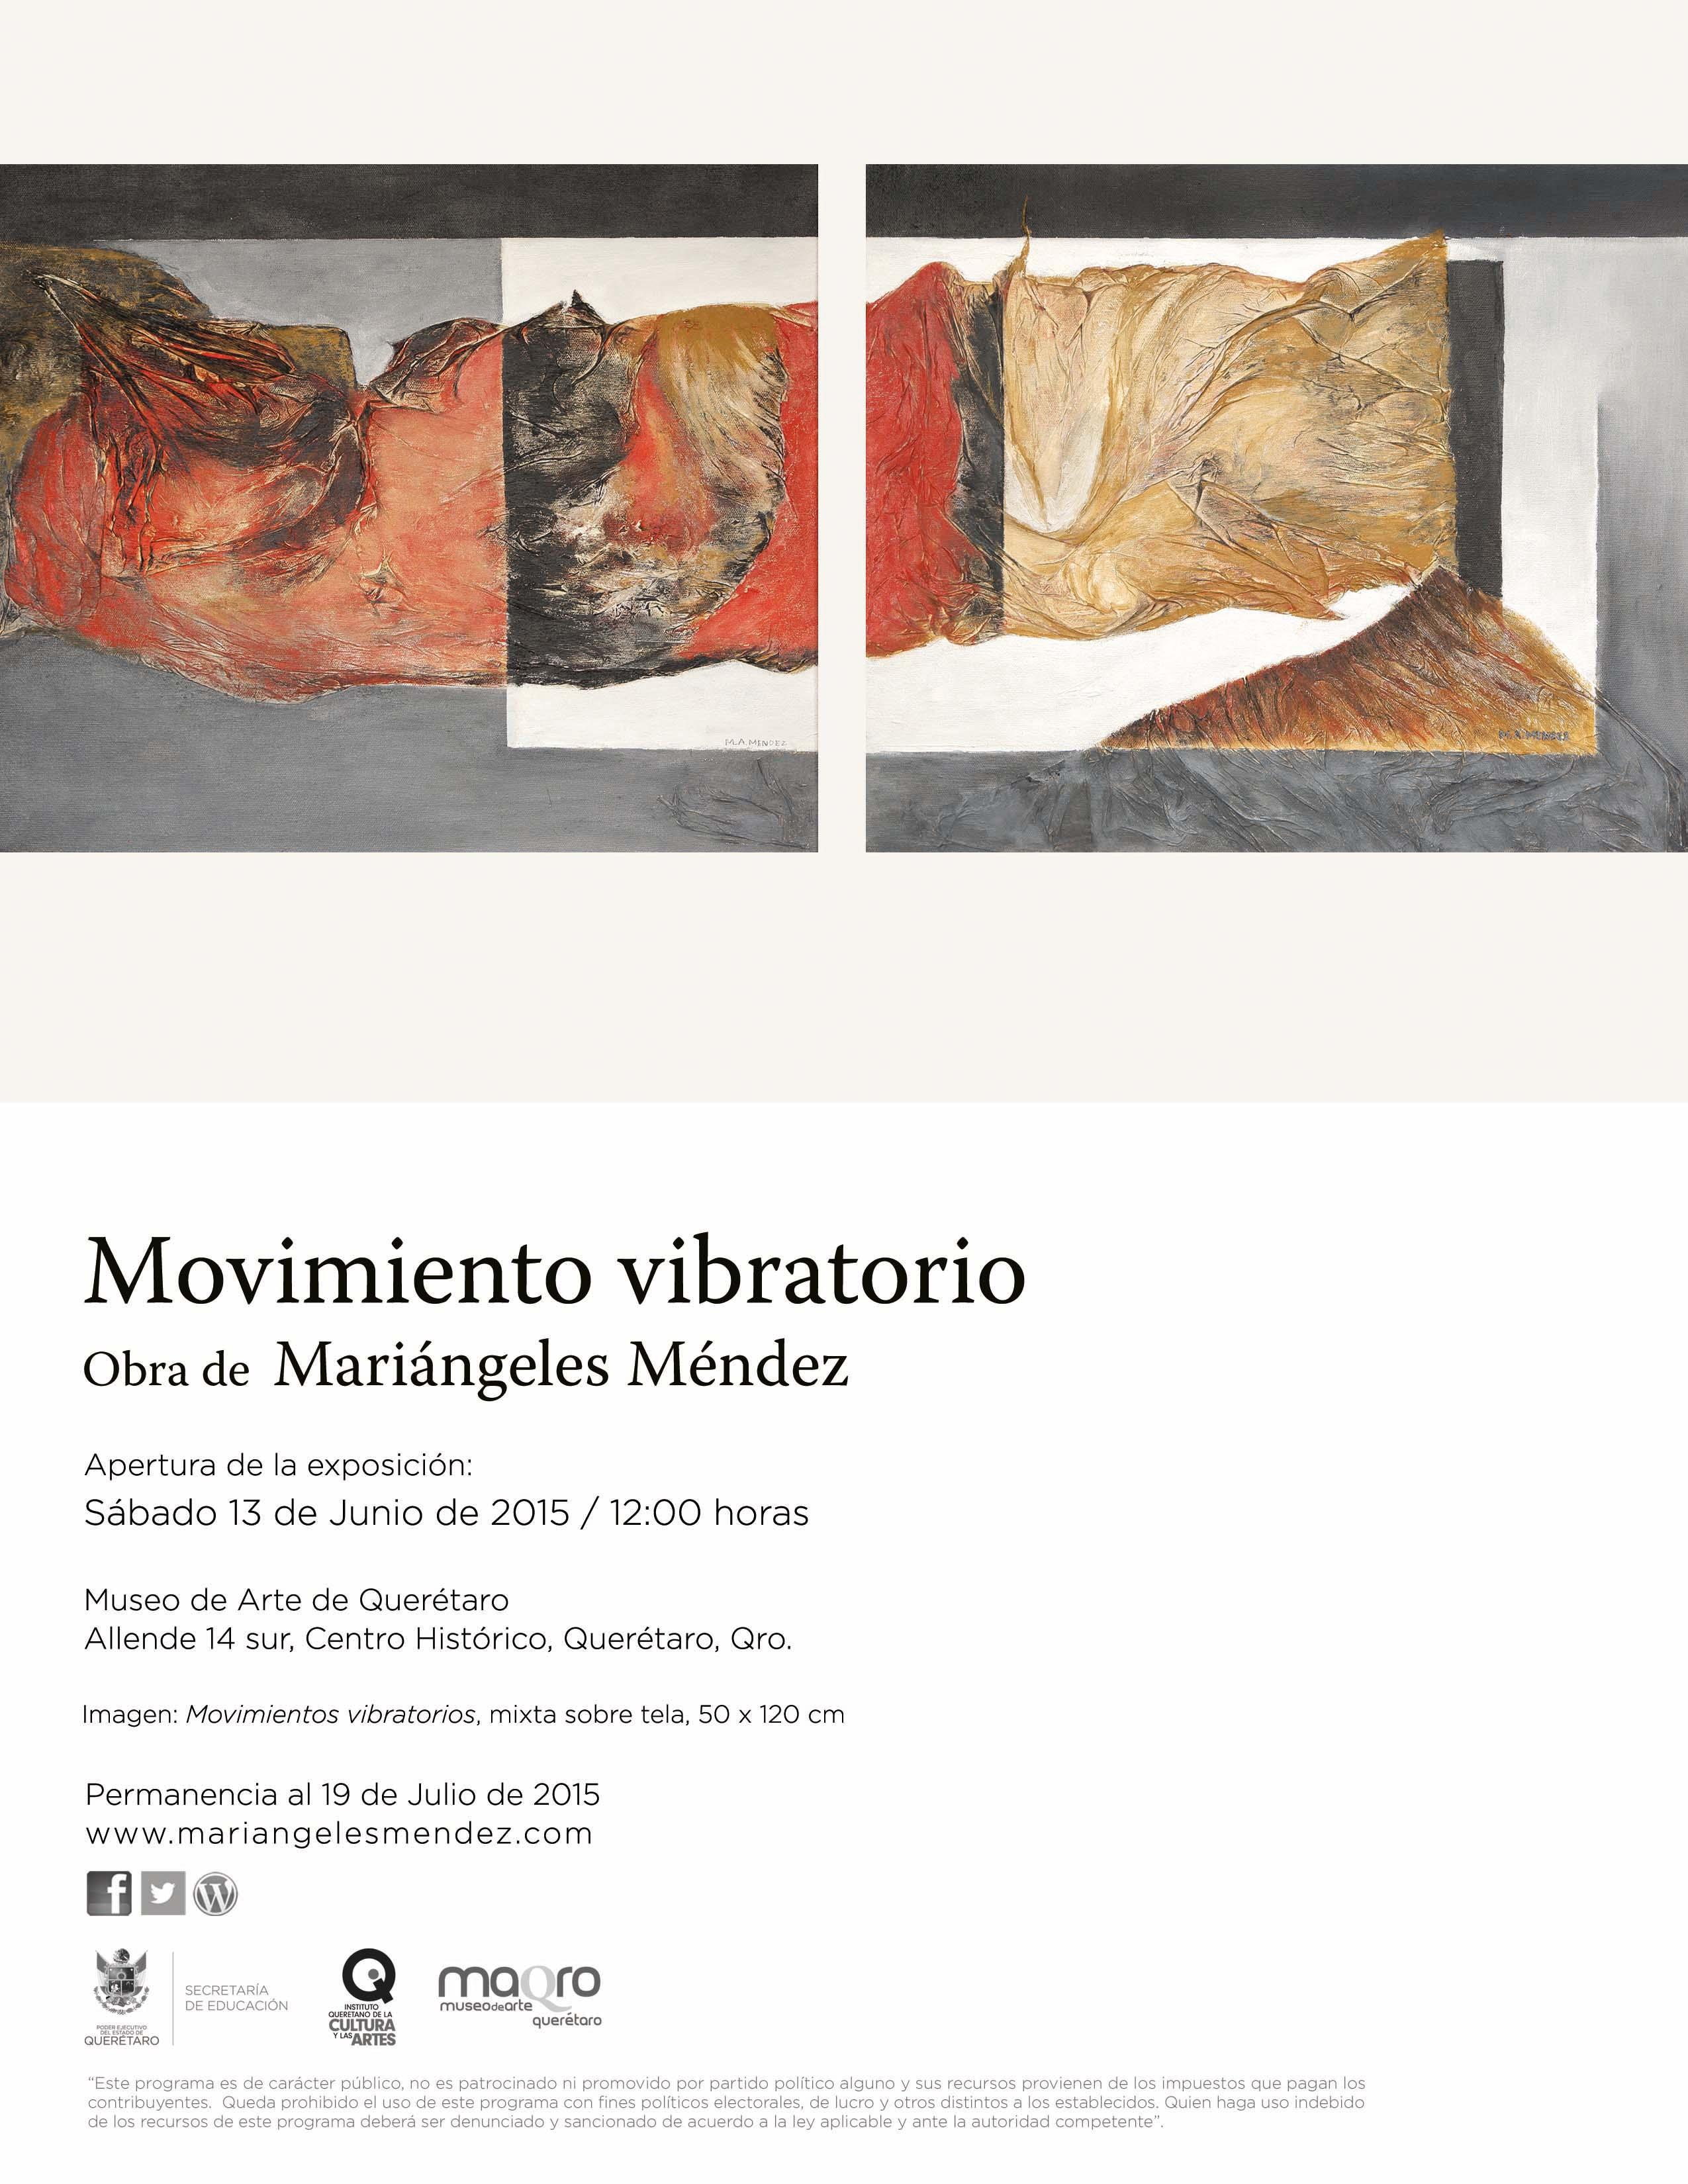 Movimiento vibratorio – Obra de Mariángeles Méndez